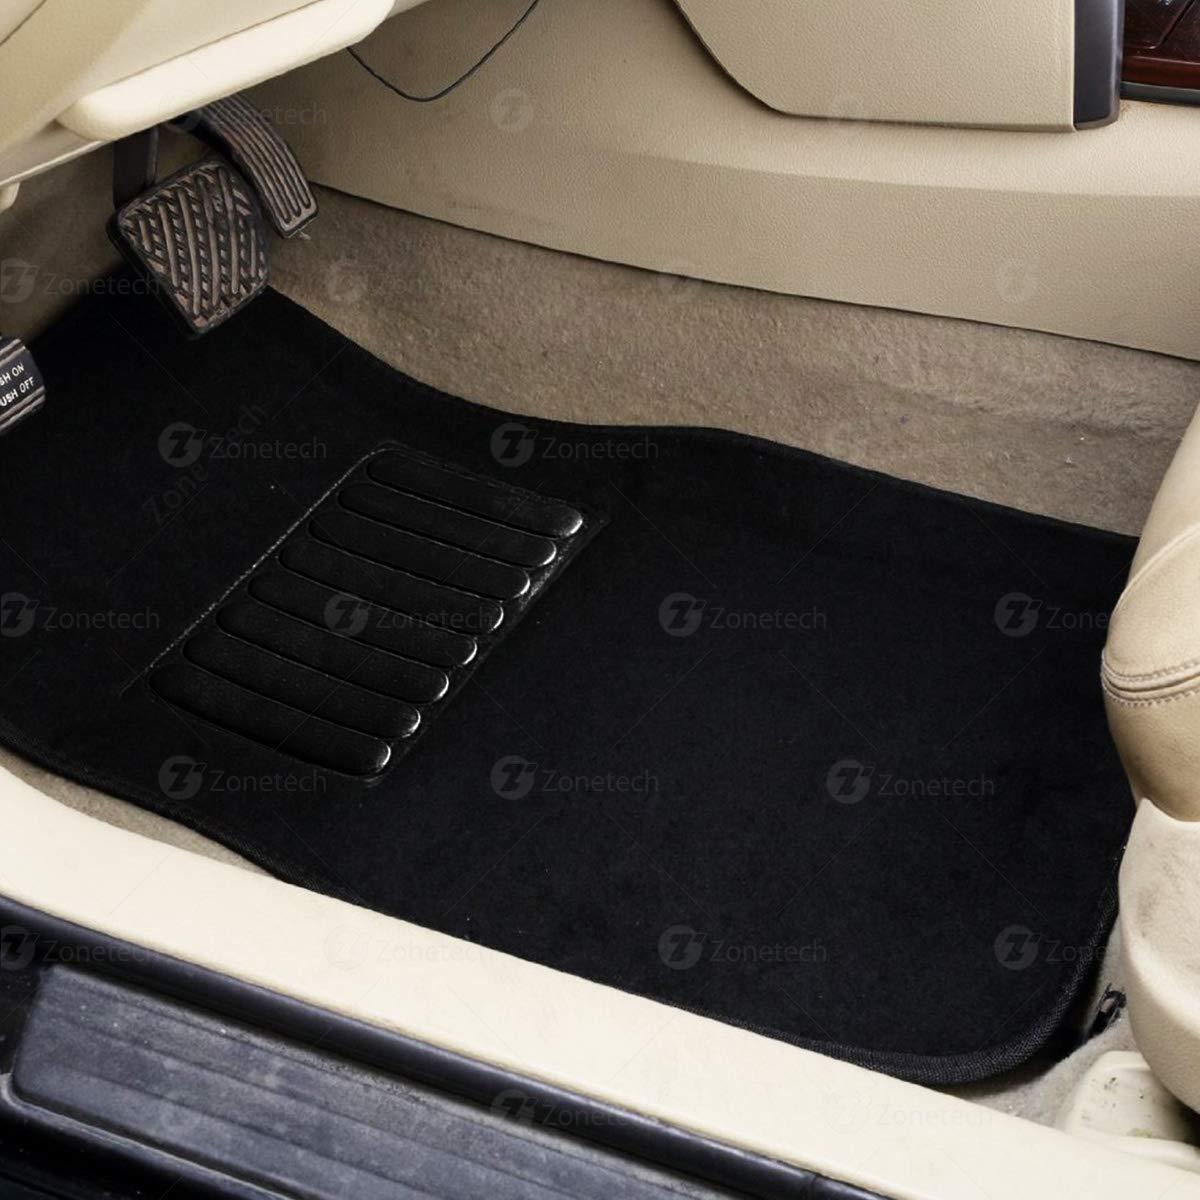 Driver Seat Zone Tech All Weather Carpet Vehicle Floor Mats 4-Piece Black Premium Quality Carpet Vehicle Floor Mats Plus Vinyl Heel Pad for Additional Protection Passenger Seat and Rear Floor Mats FM0005